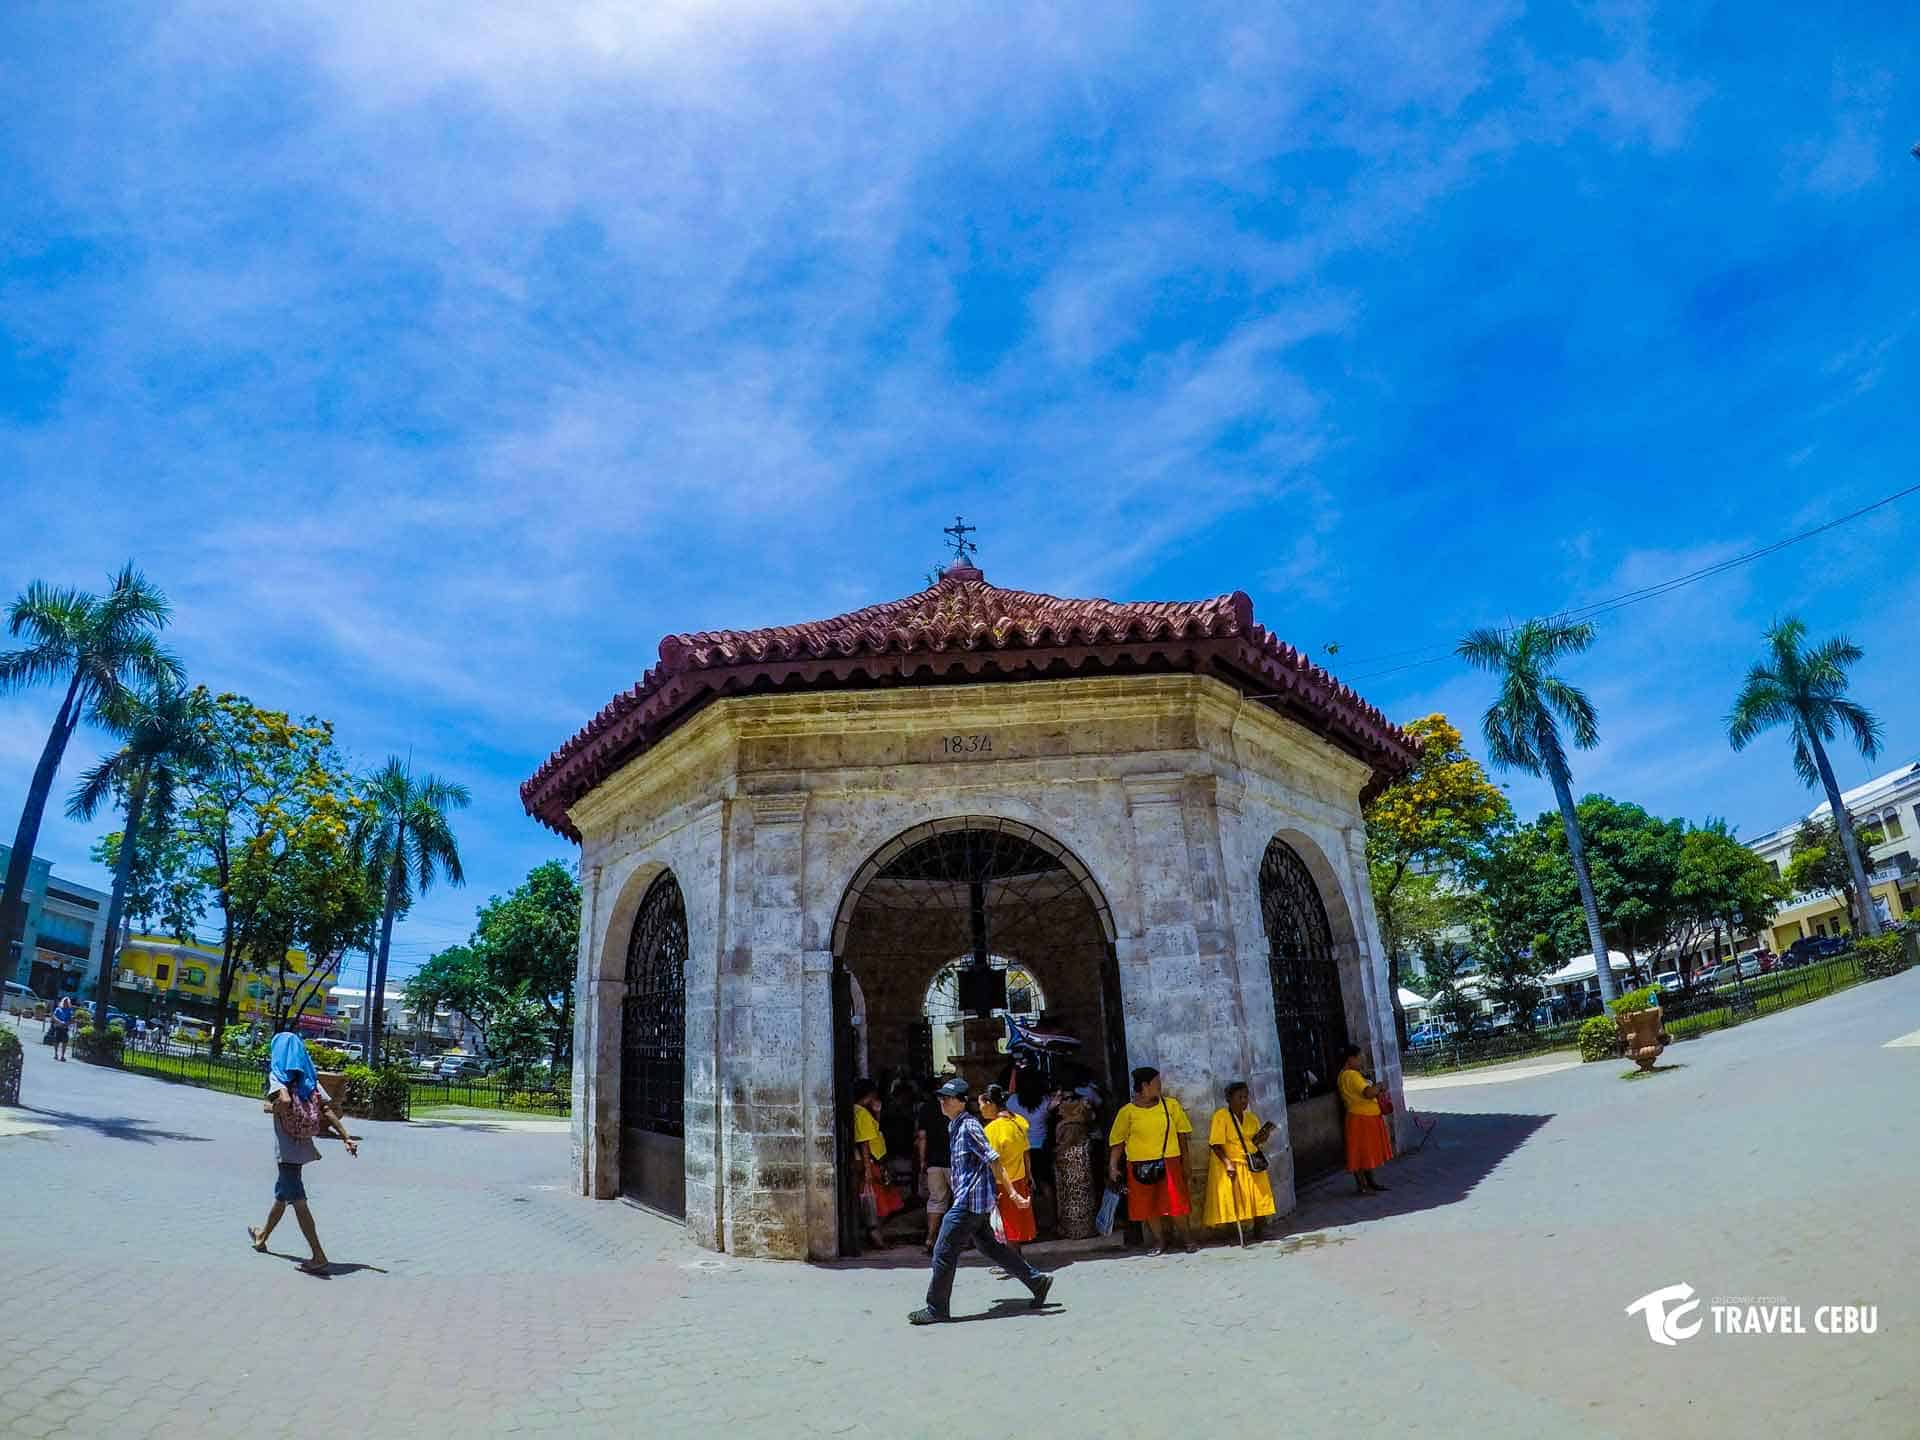 Magellan's cross tour cebu